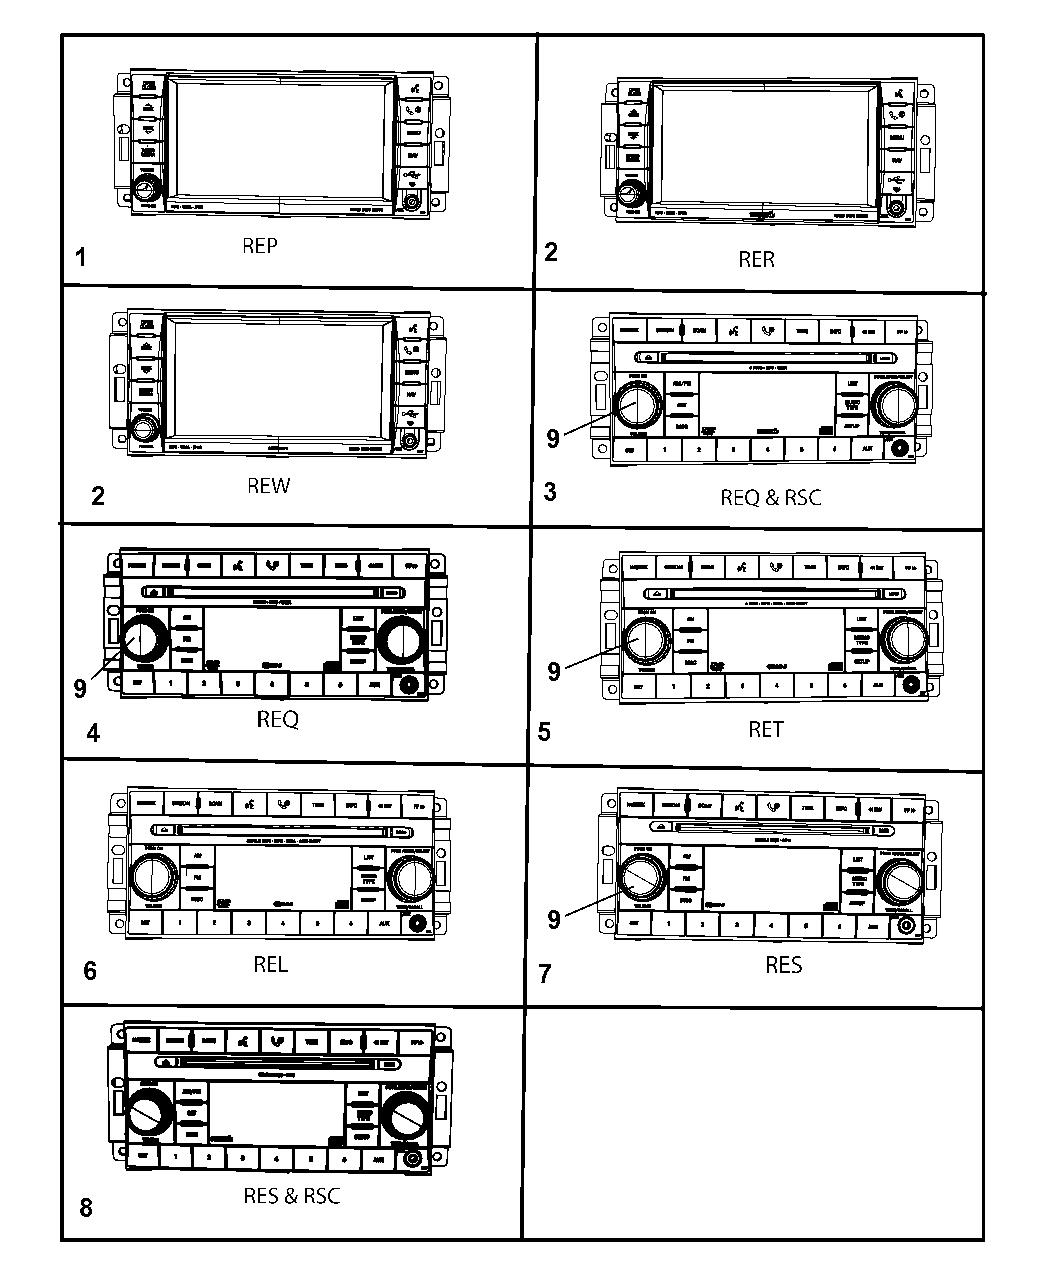 2008 Jeep Wrangler Radios - Mopar Parts Giant Mopar Ae Radio Wiring Diagram on